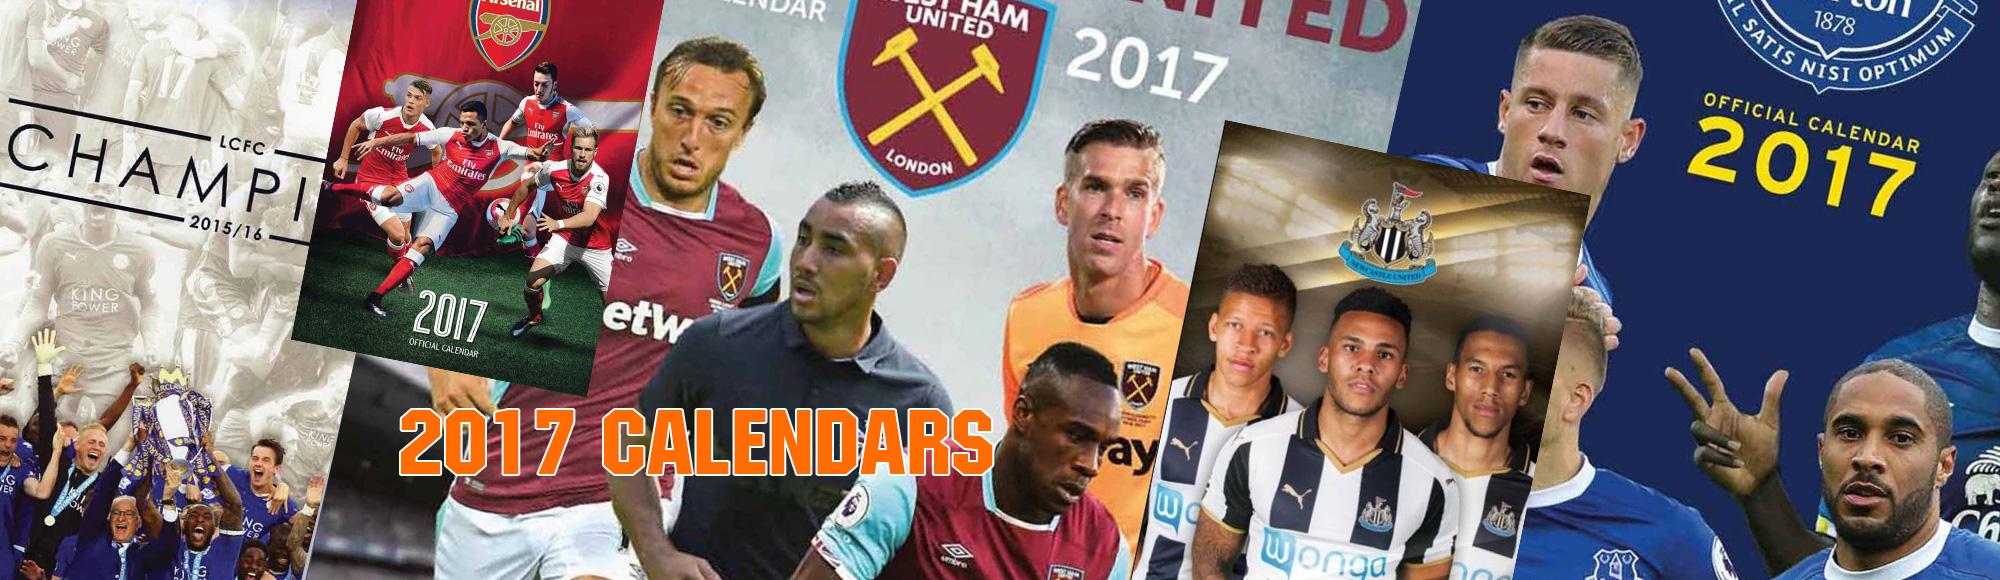 2017 football calendars